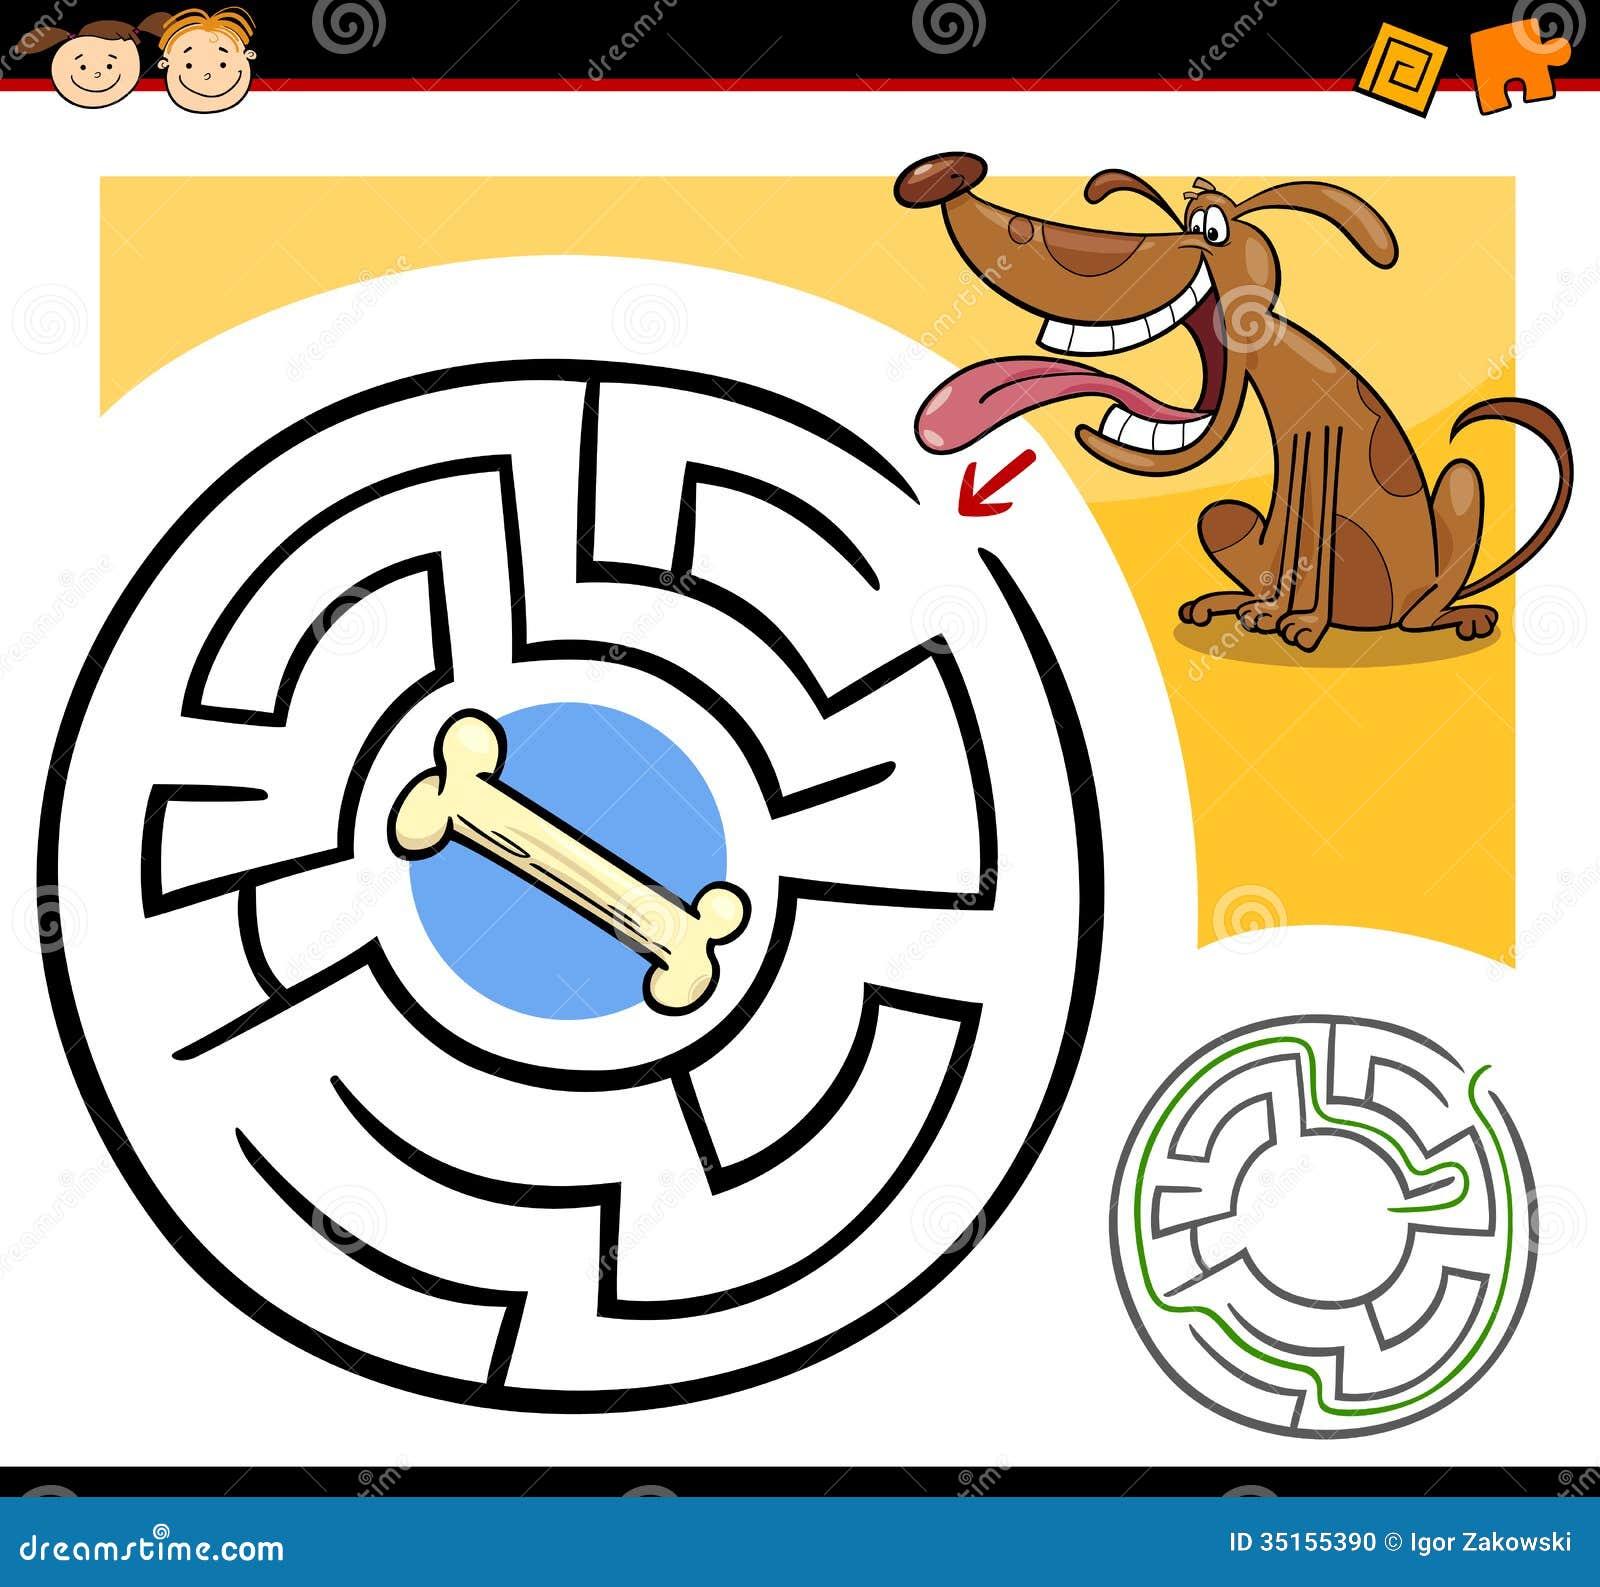 cartoon maze or labyrinth game stock photo image 35155390